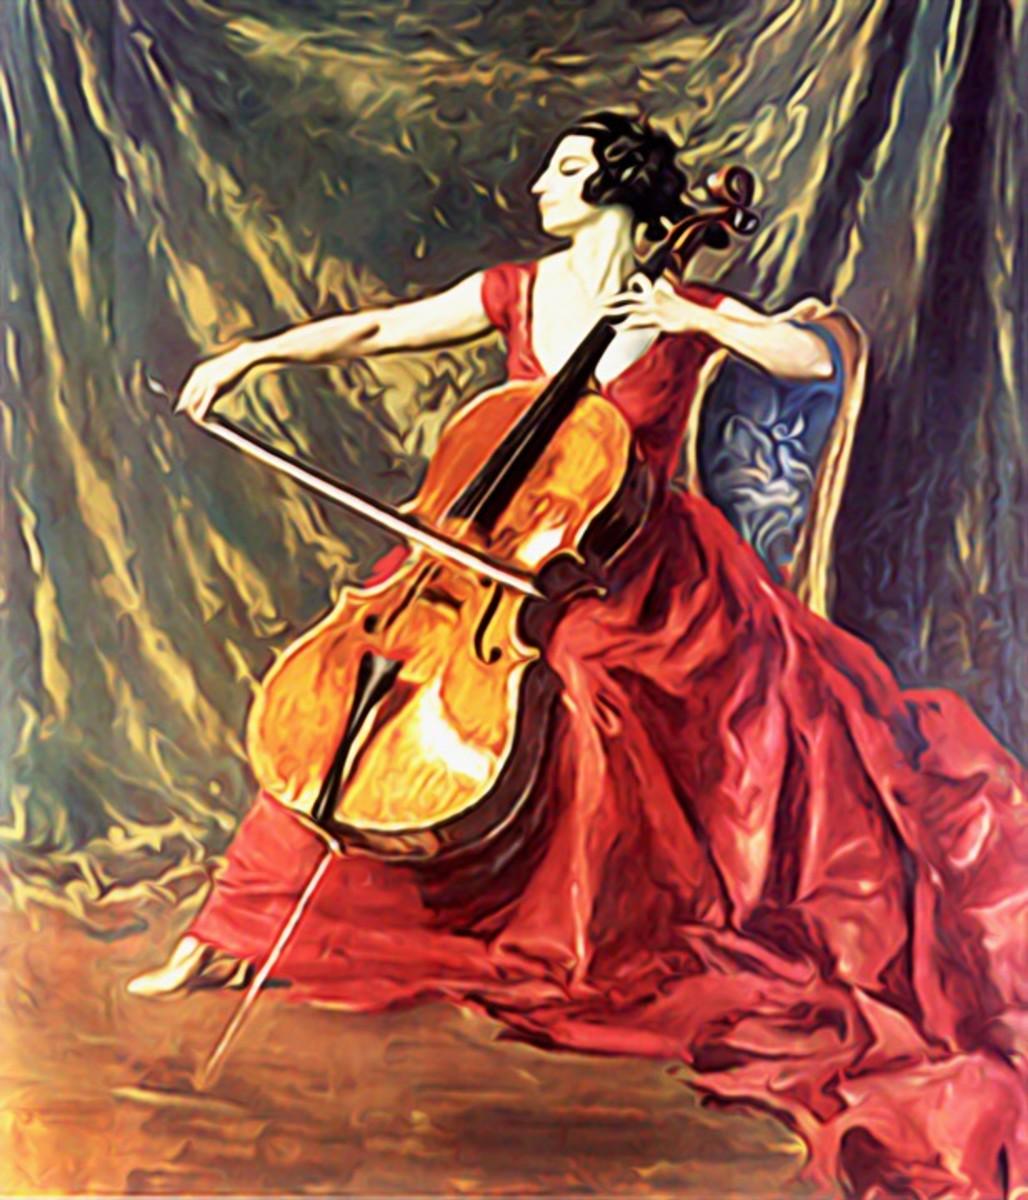 Violin, music, woman playing violin Chromesthesia